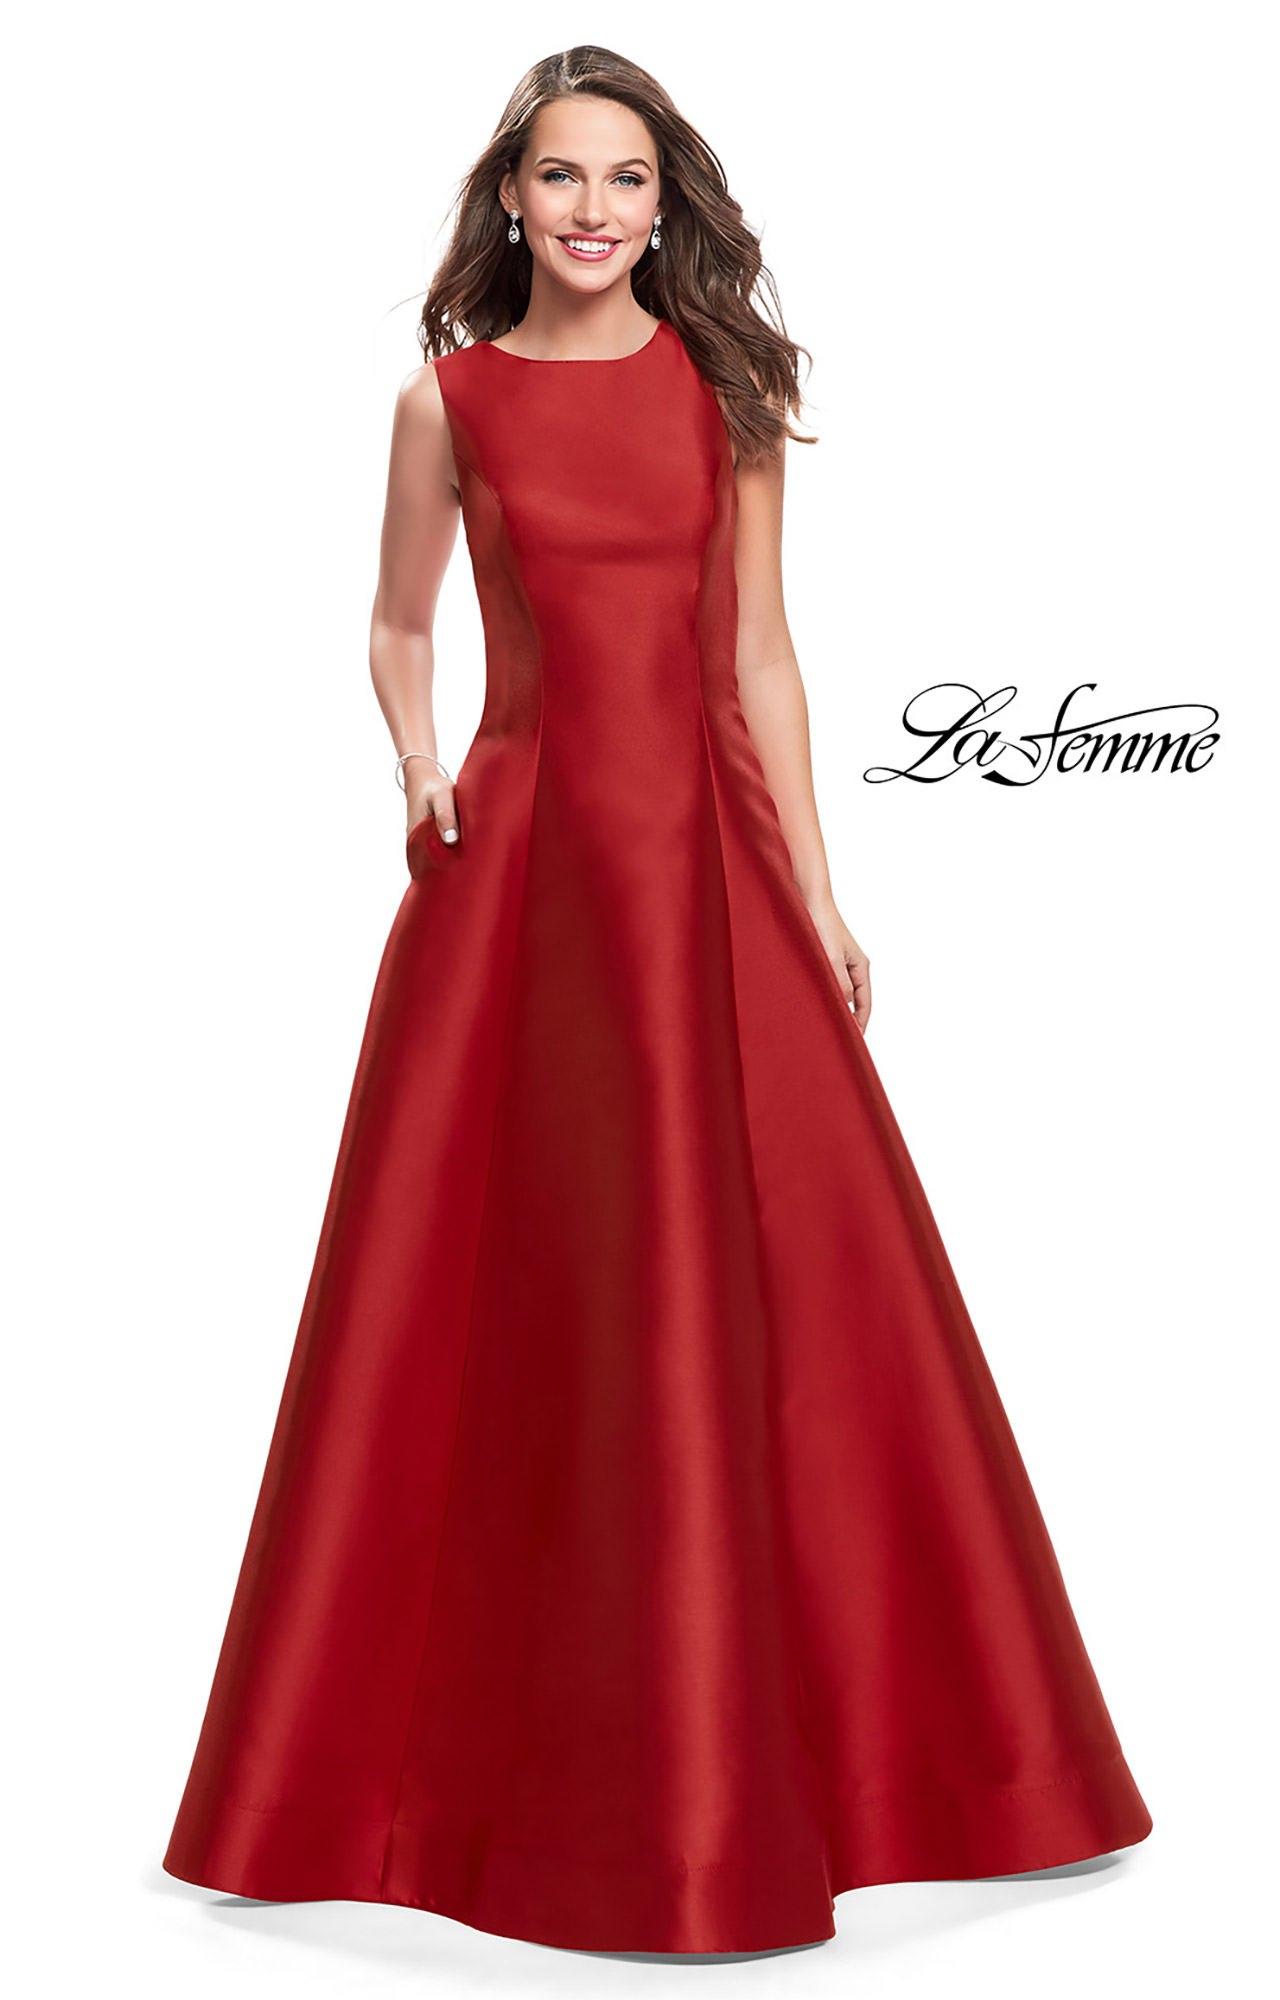 La Femme 25425 - Long Mikado Ball Gown Prom Dress